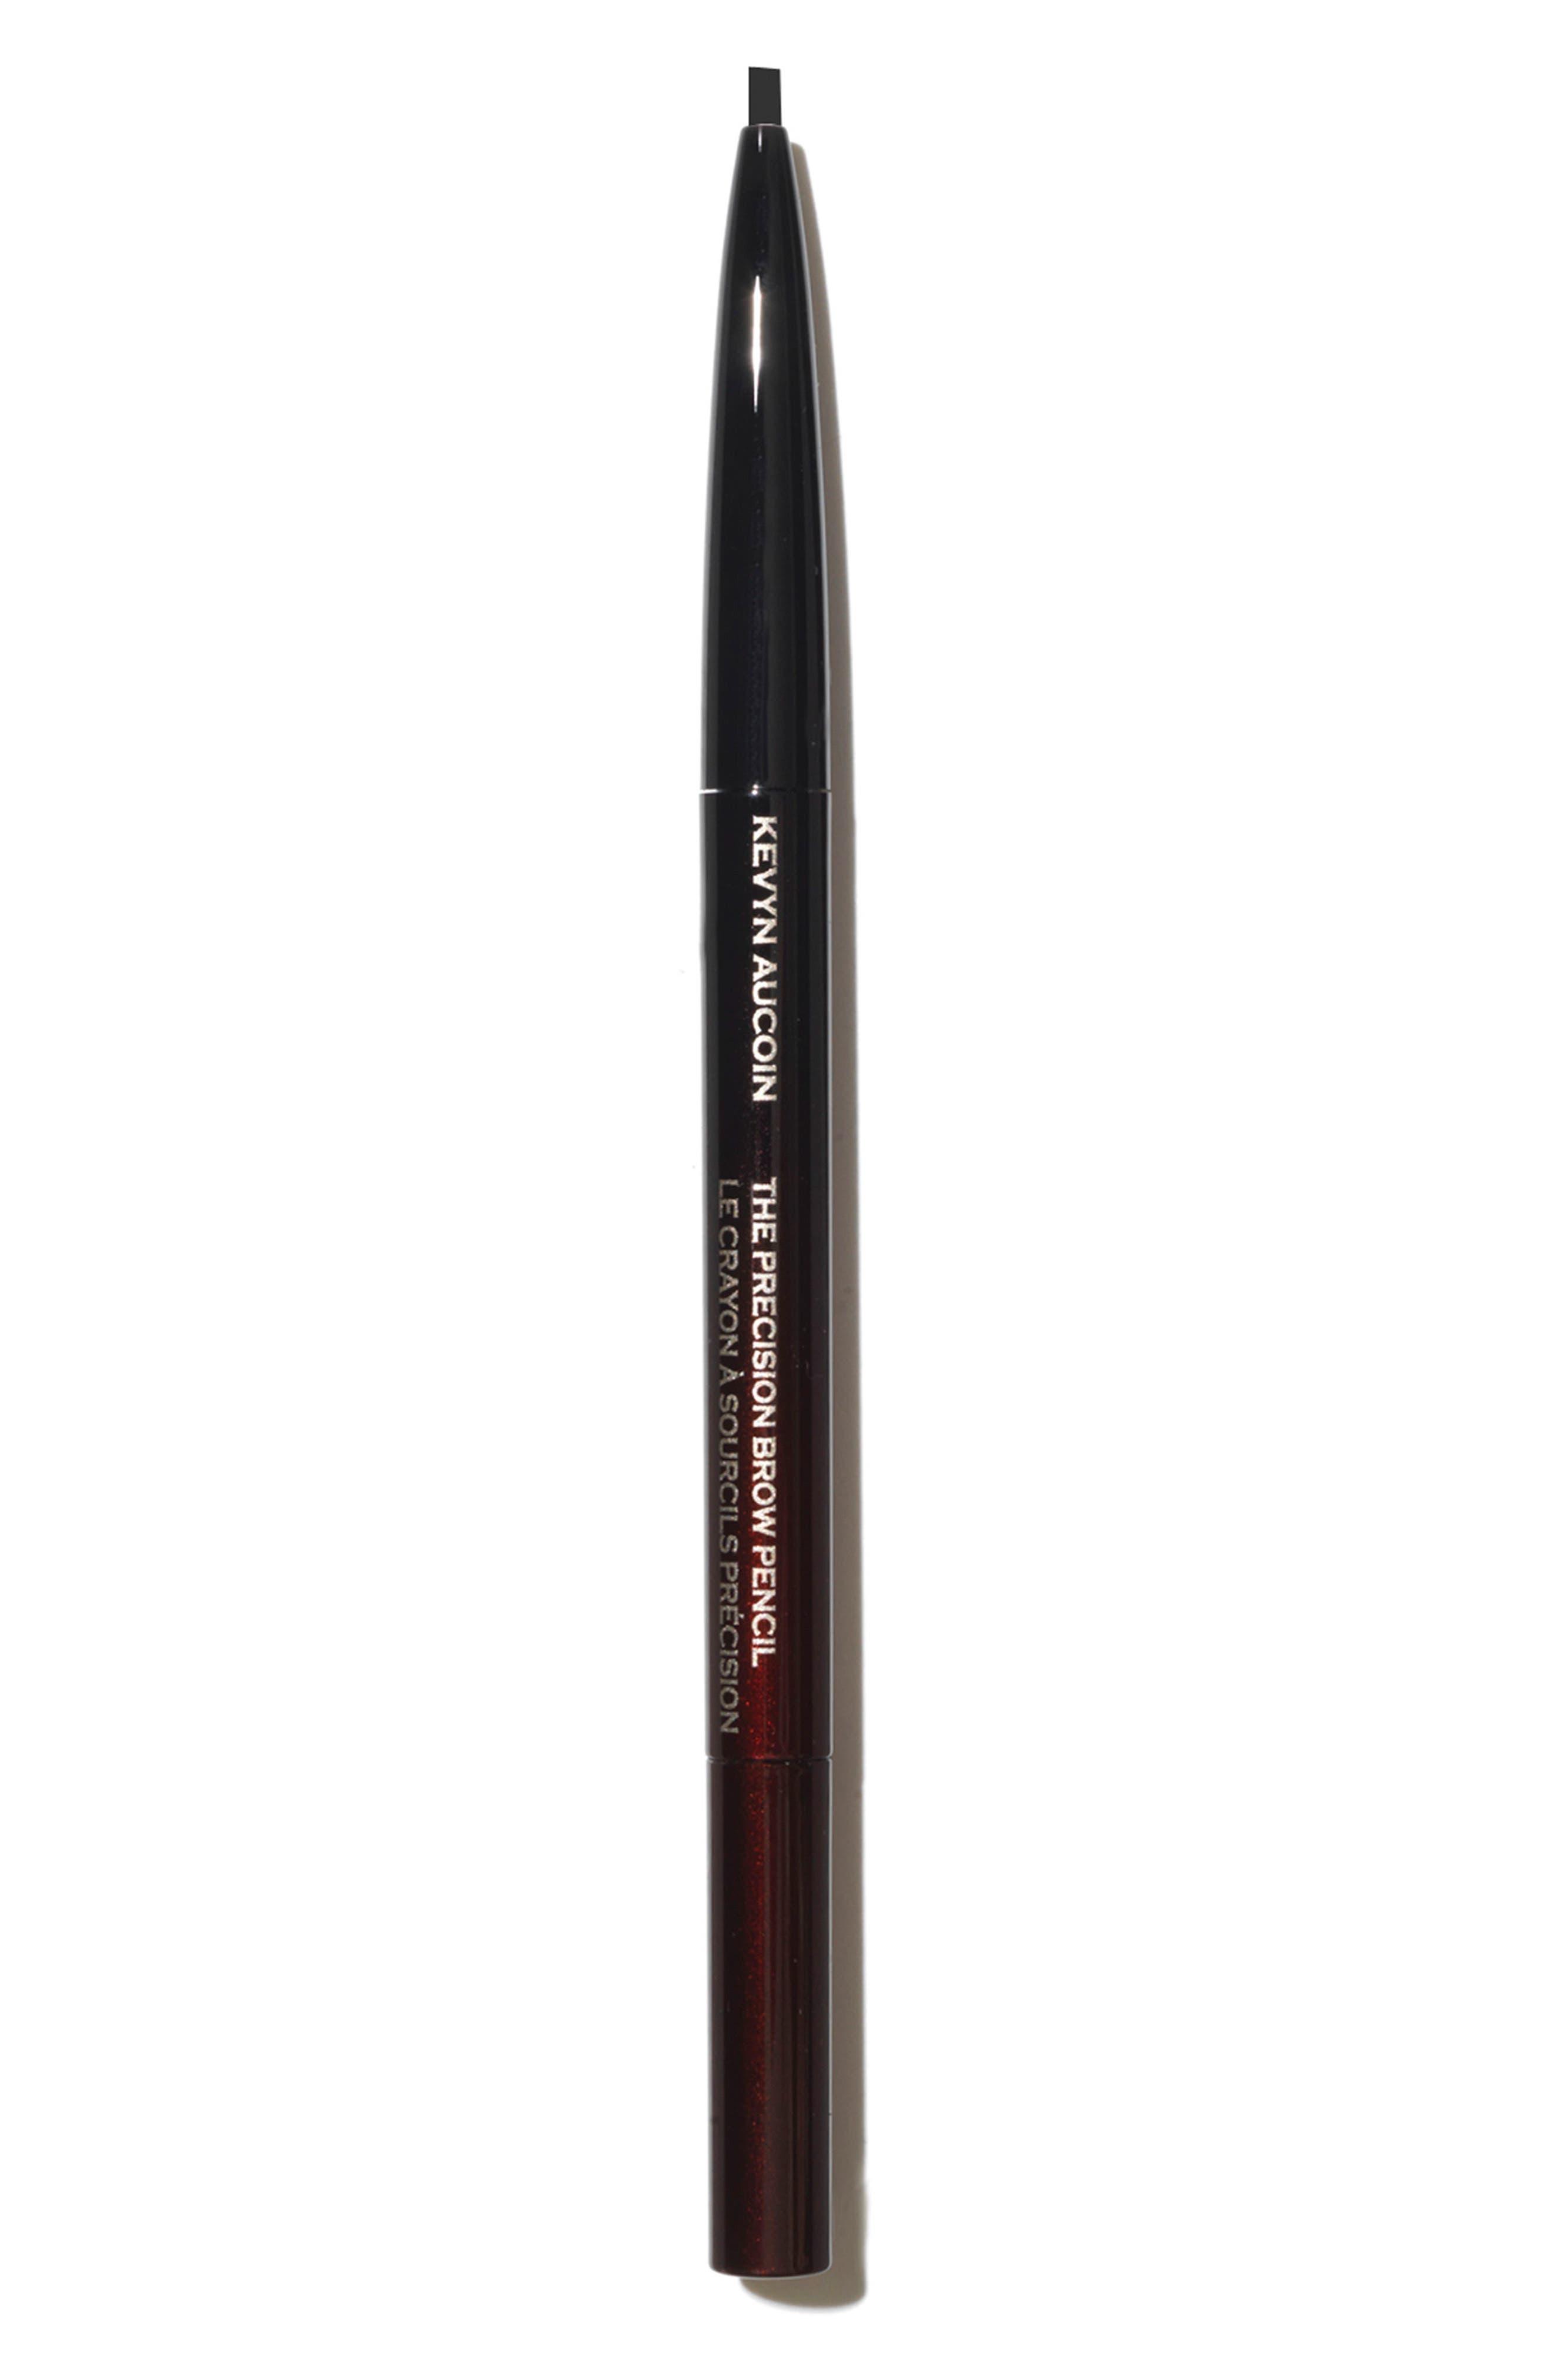 SPACE.NK.apothecary Kevyn Aucoin Beauty The Precision Brow Pencil